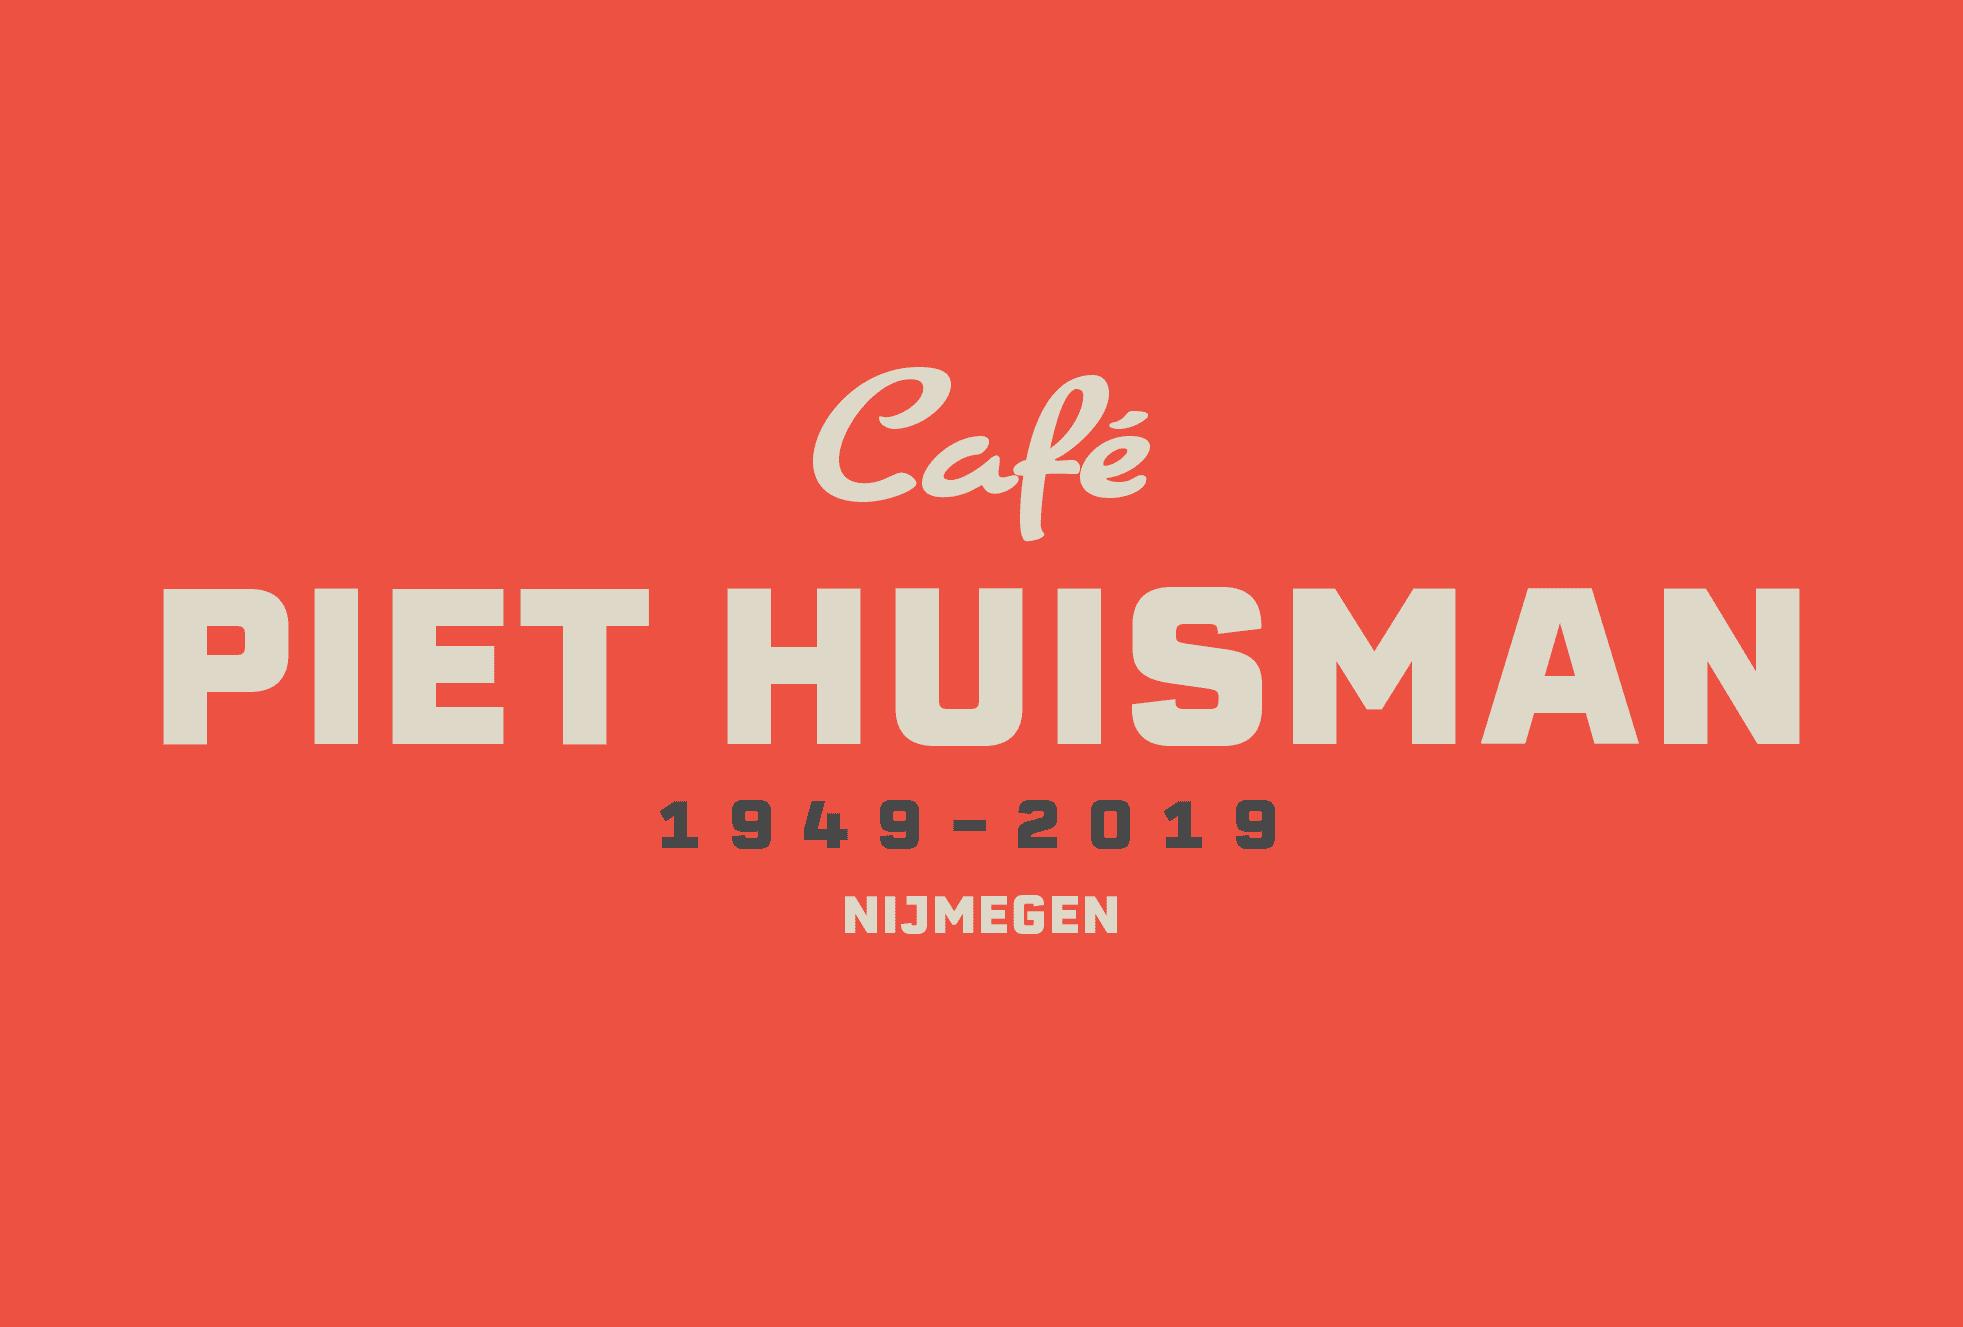 Café Piet Huisman - Logo